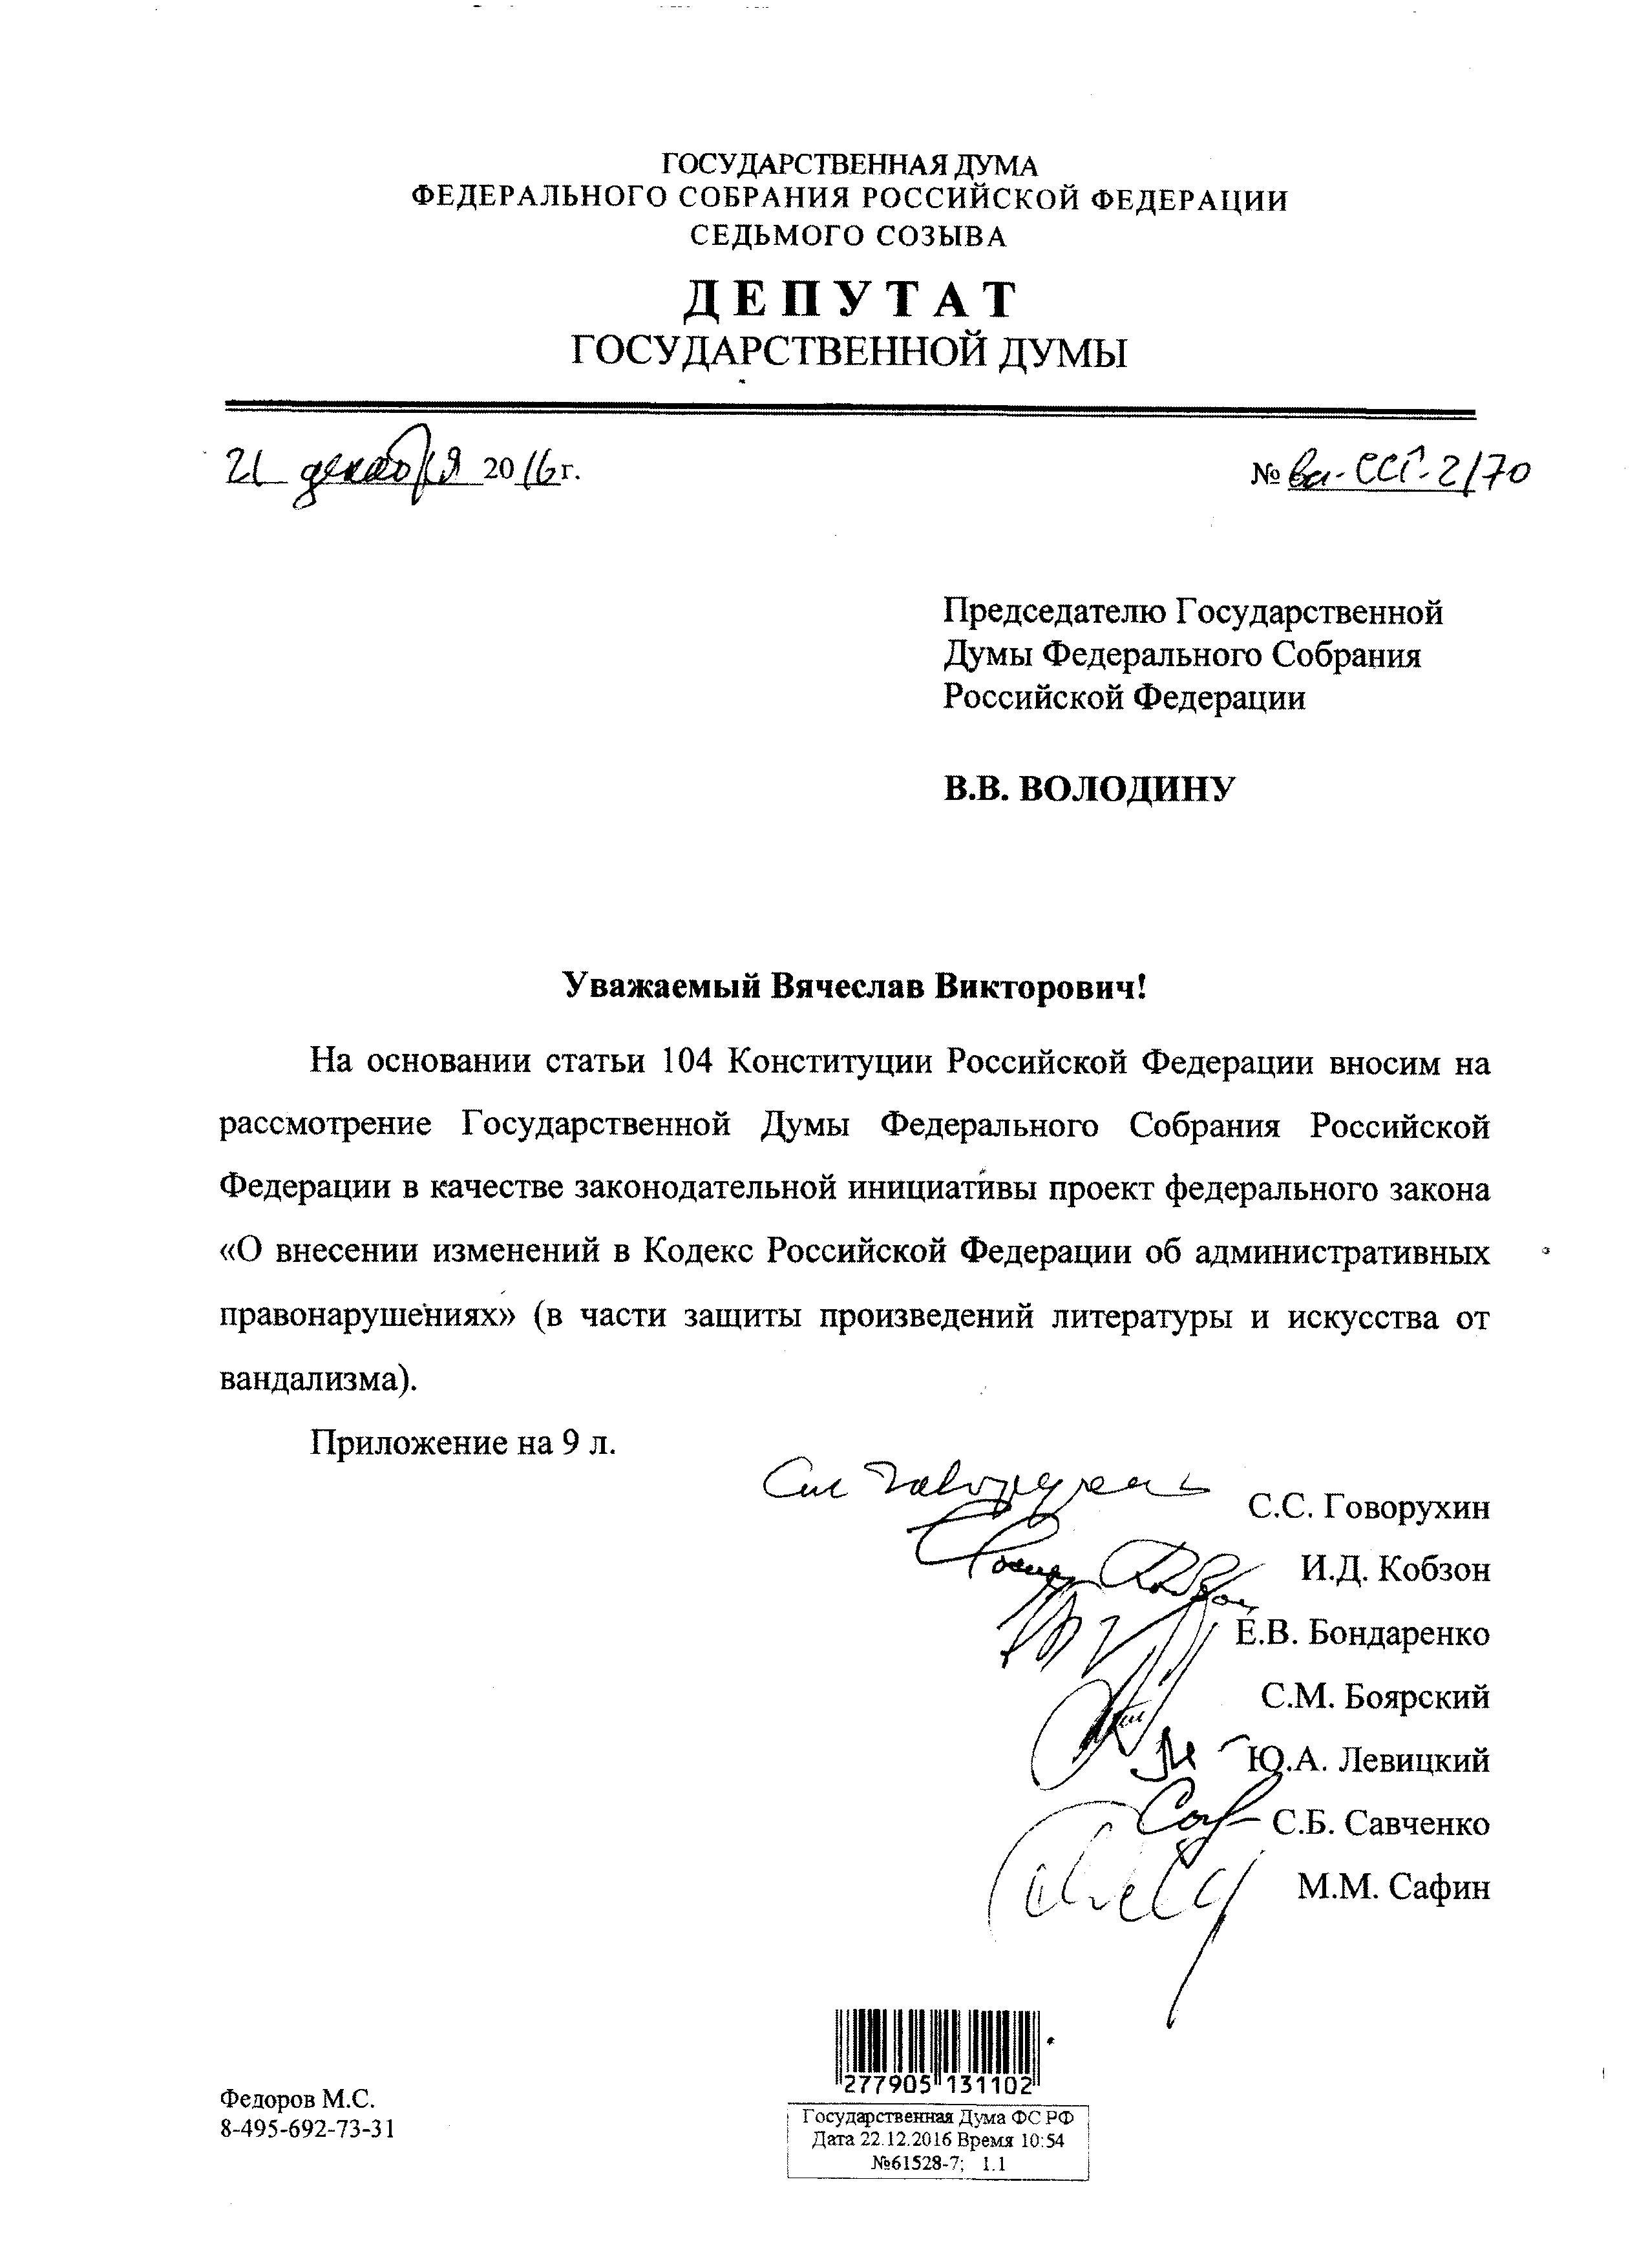 http://protivkart.org/uploads/posts/2016-12/1482502742_govoruhin1a-001.jpg